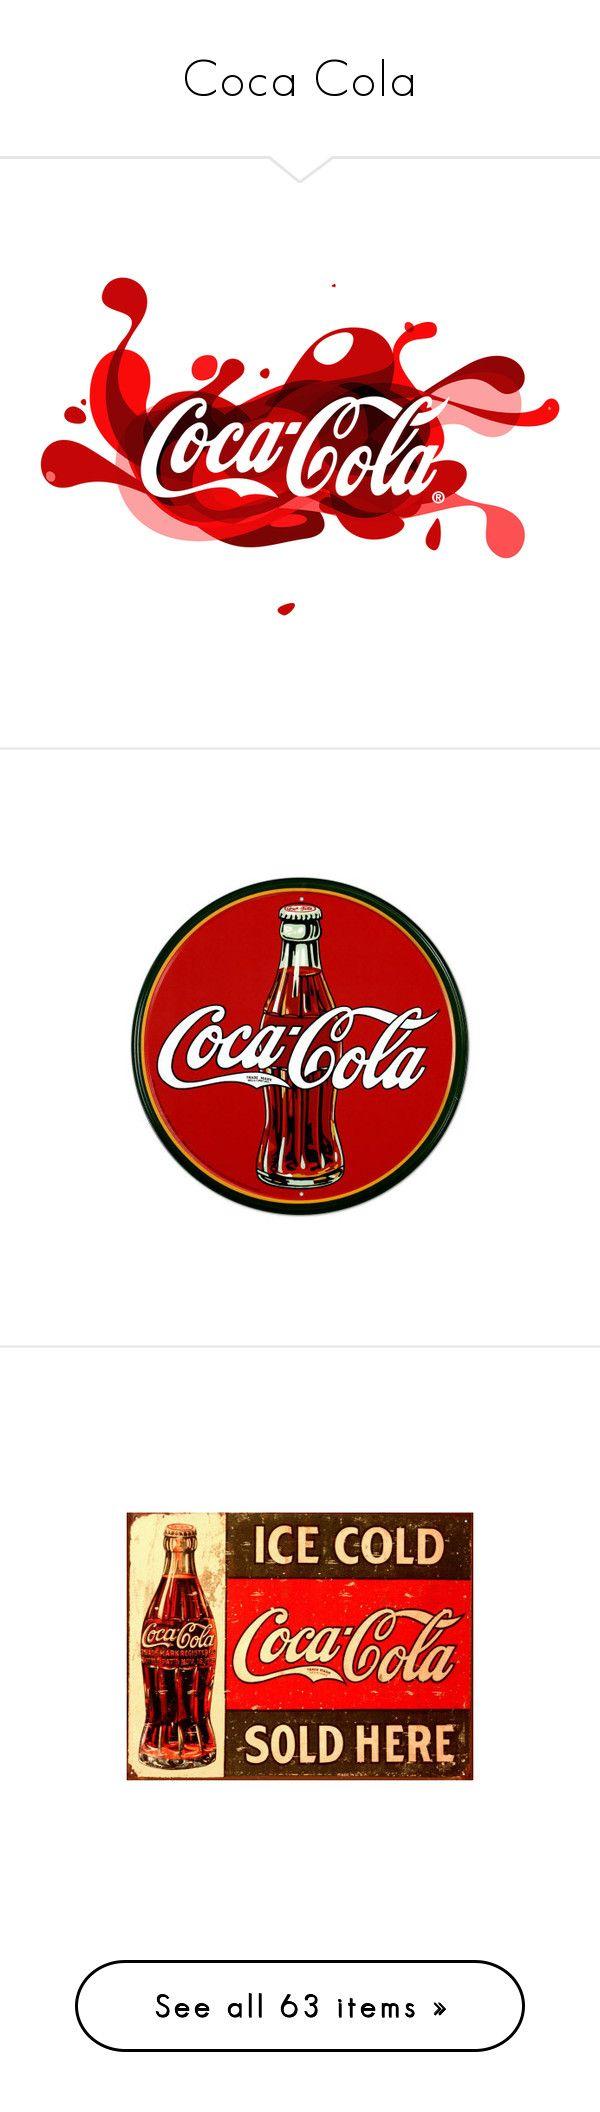 Coca Cola Quotes The 25 Best Coca Cola Quotes Ideas On Pinterest  Coke Coca Cola